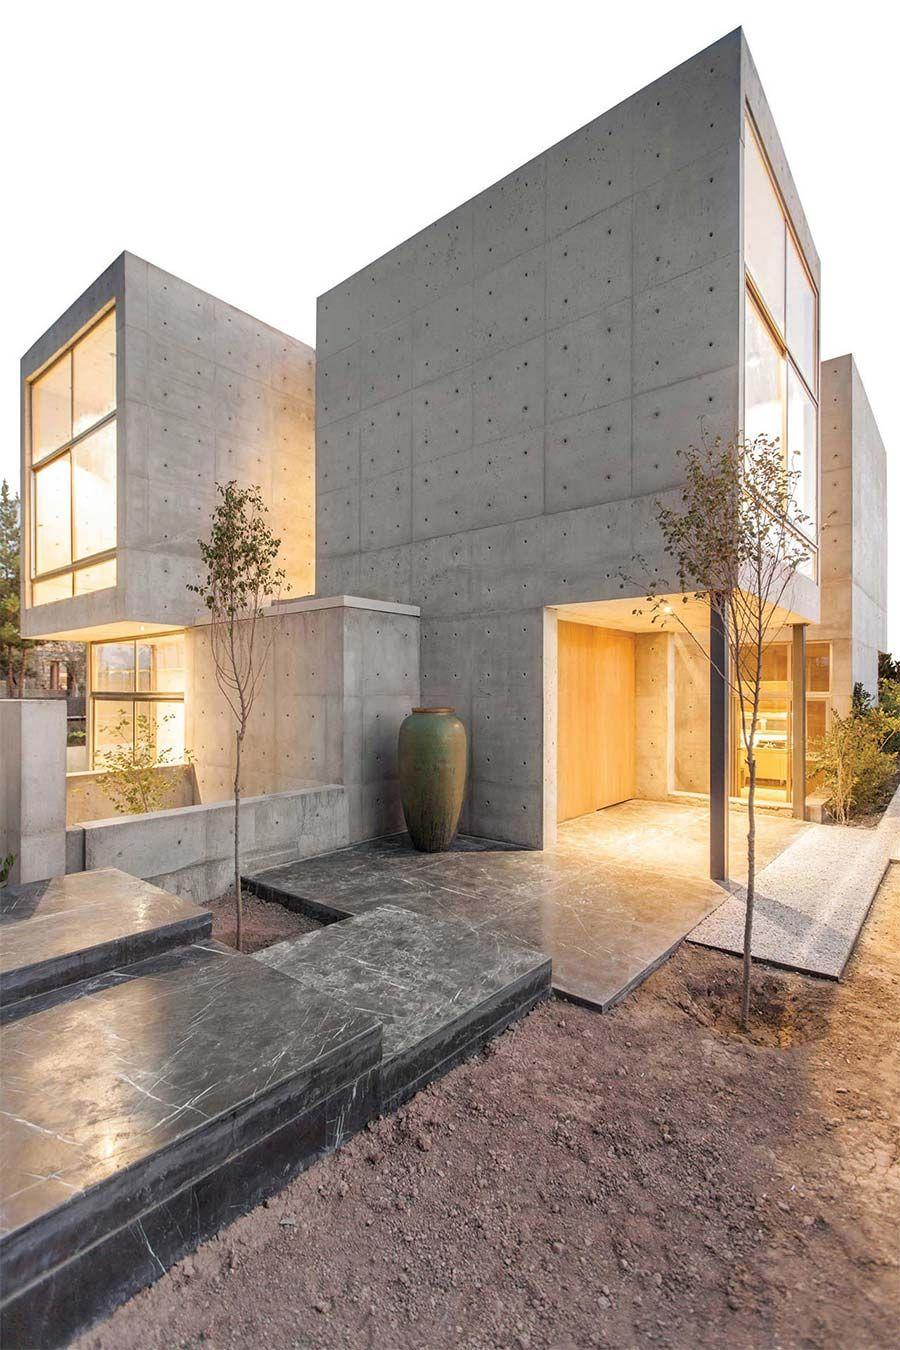 Villa No.131 | Tolle Hütte | Maison et objet, Maison moderne und ...